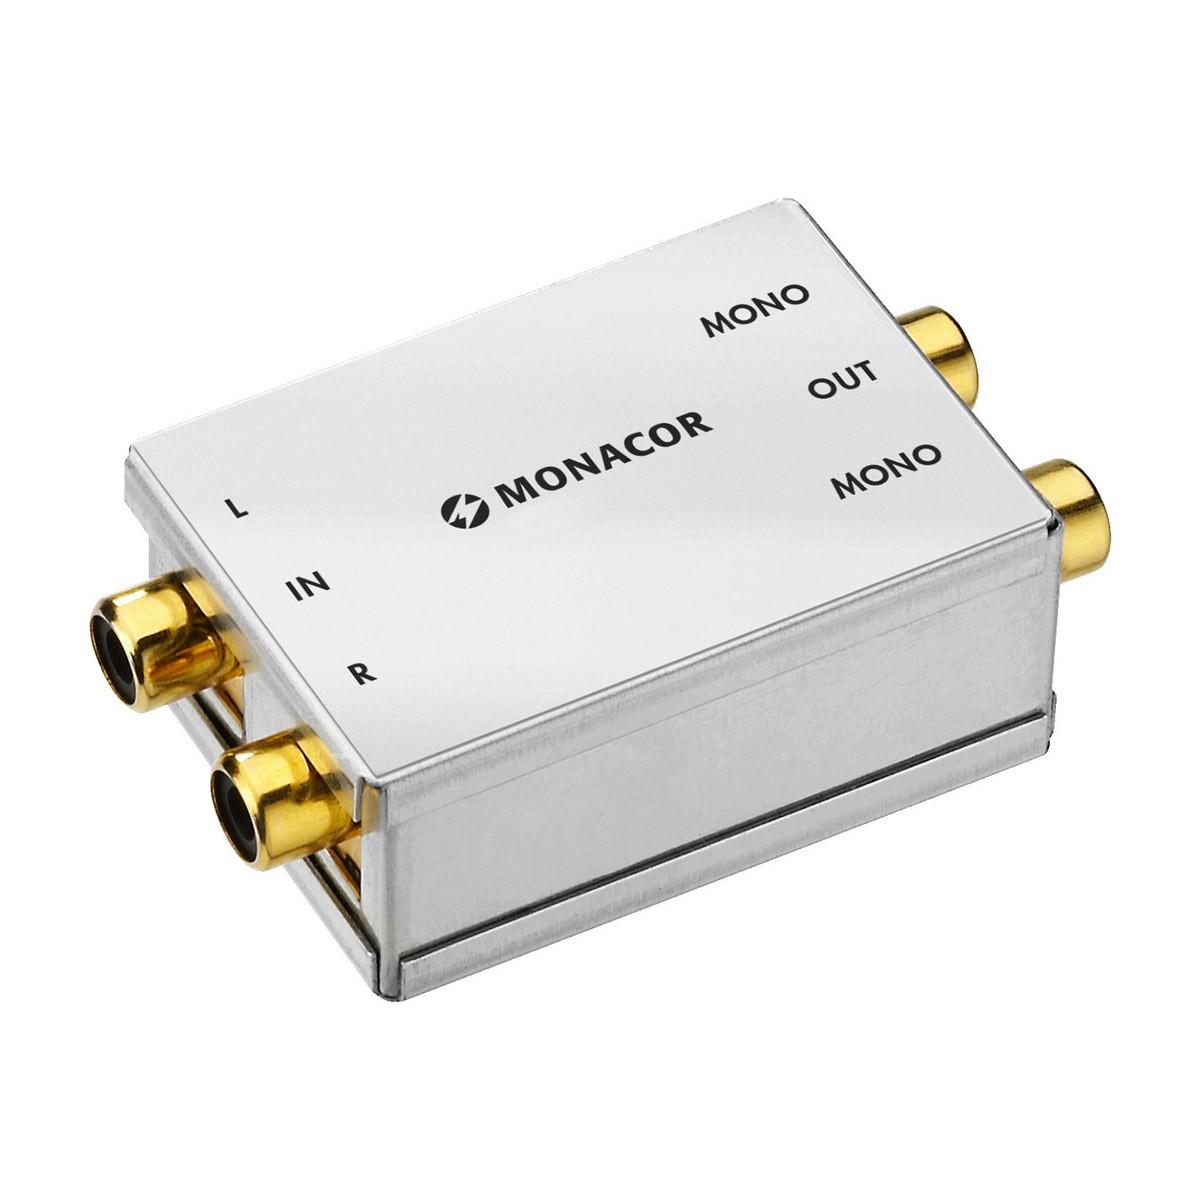 MONACOR Stereo to Dual Mono Converter RCA